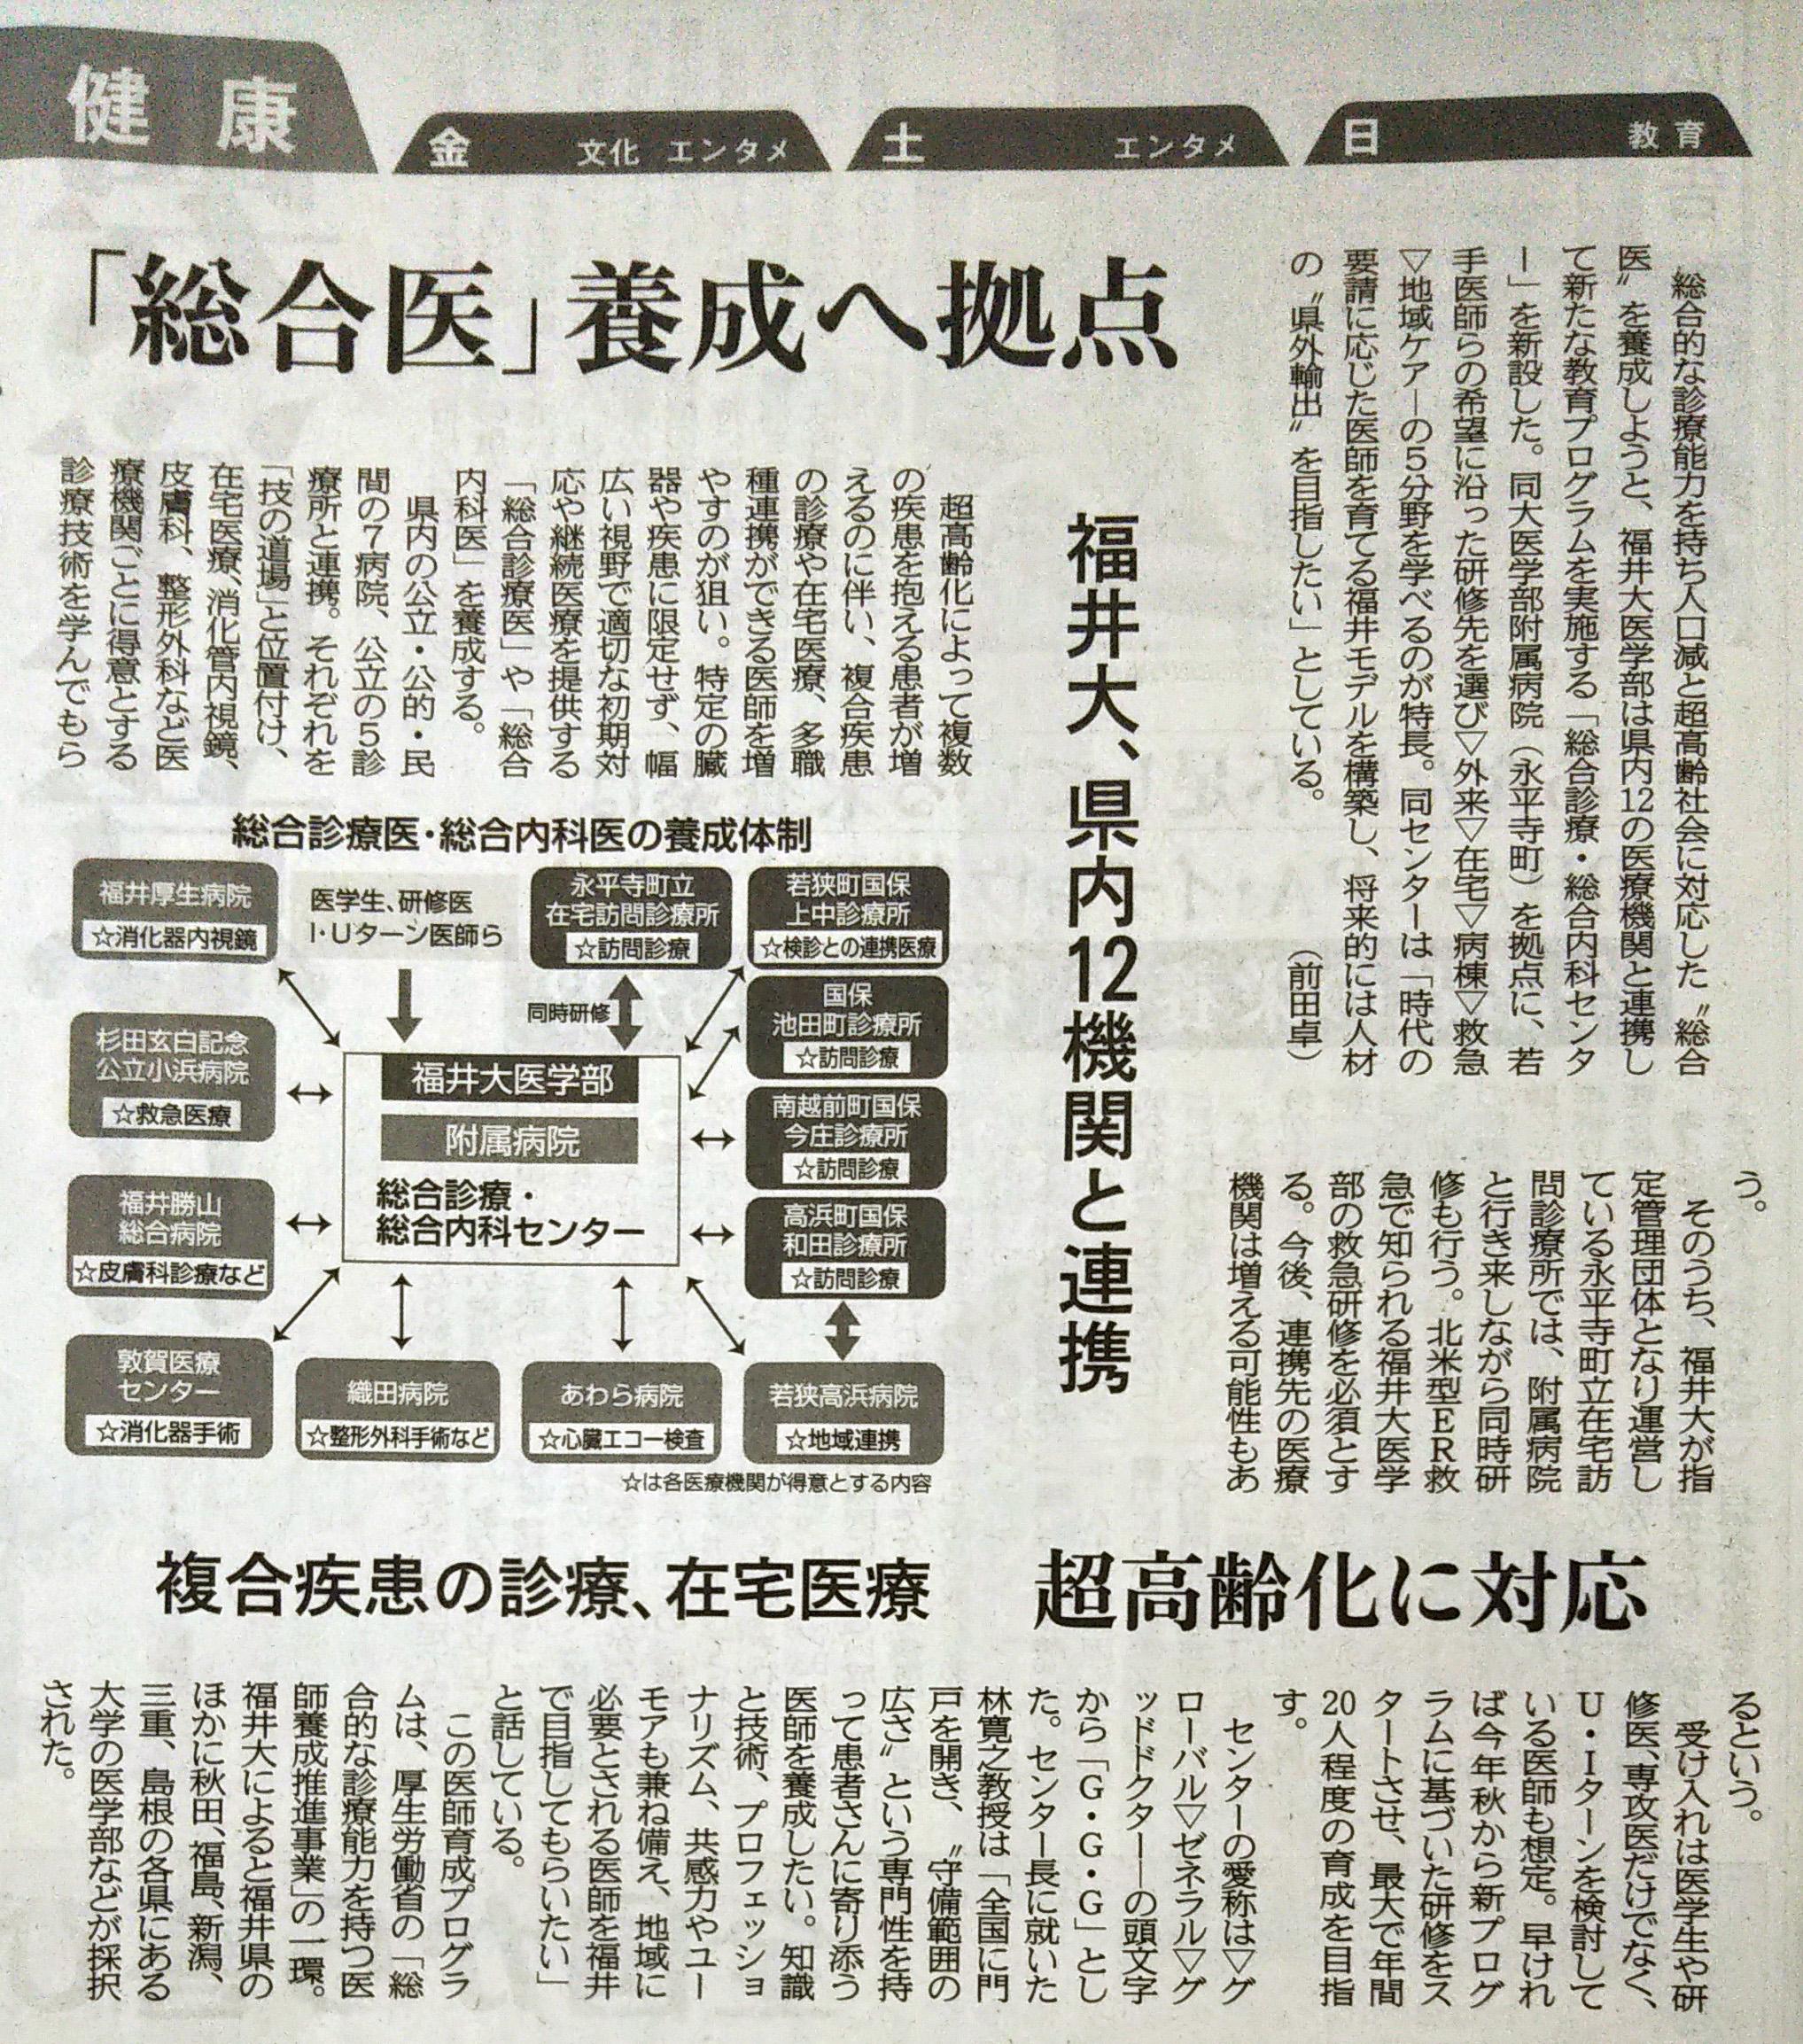 GGGセンターが福井新聞に紹介されました!